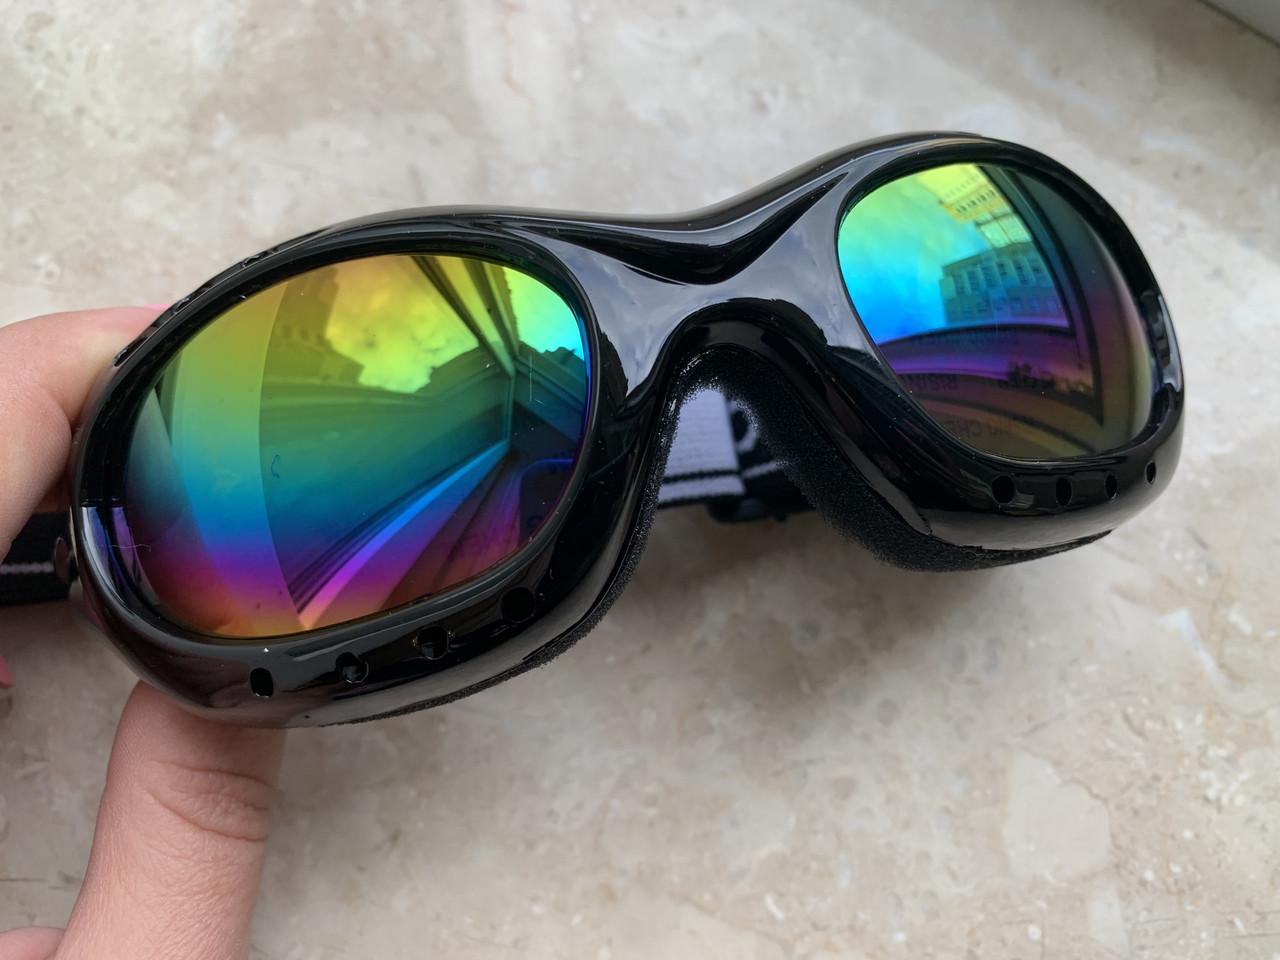 Мото очки для Каски под мото скутер мопед